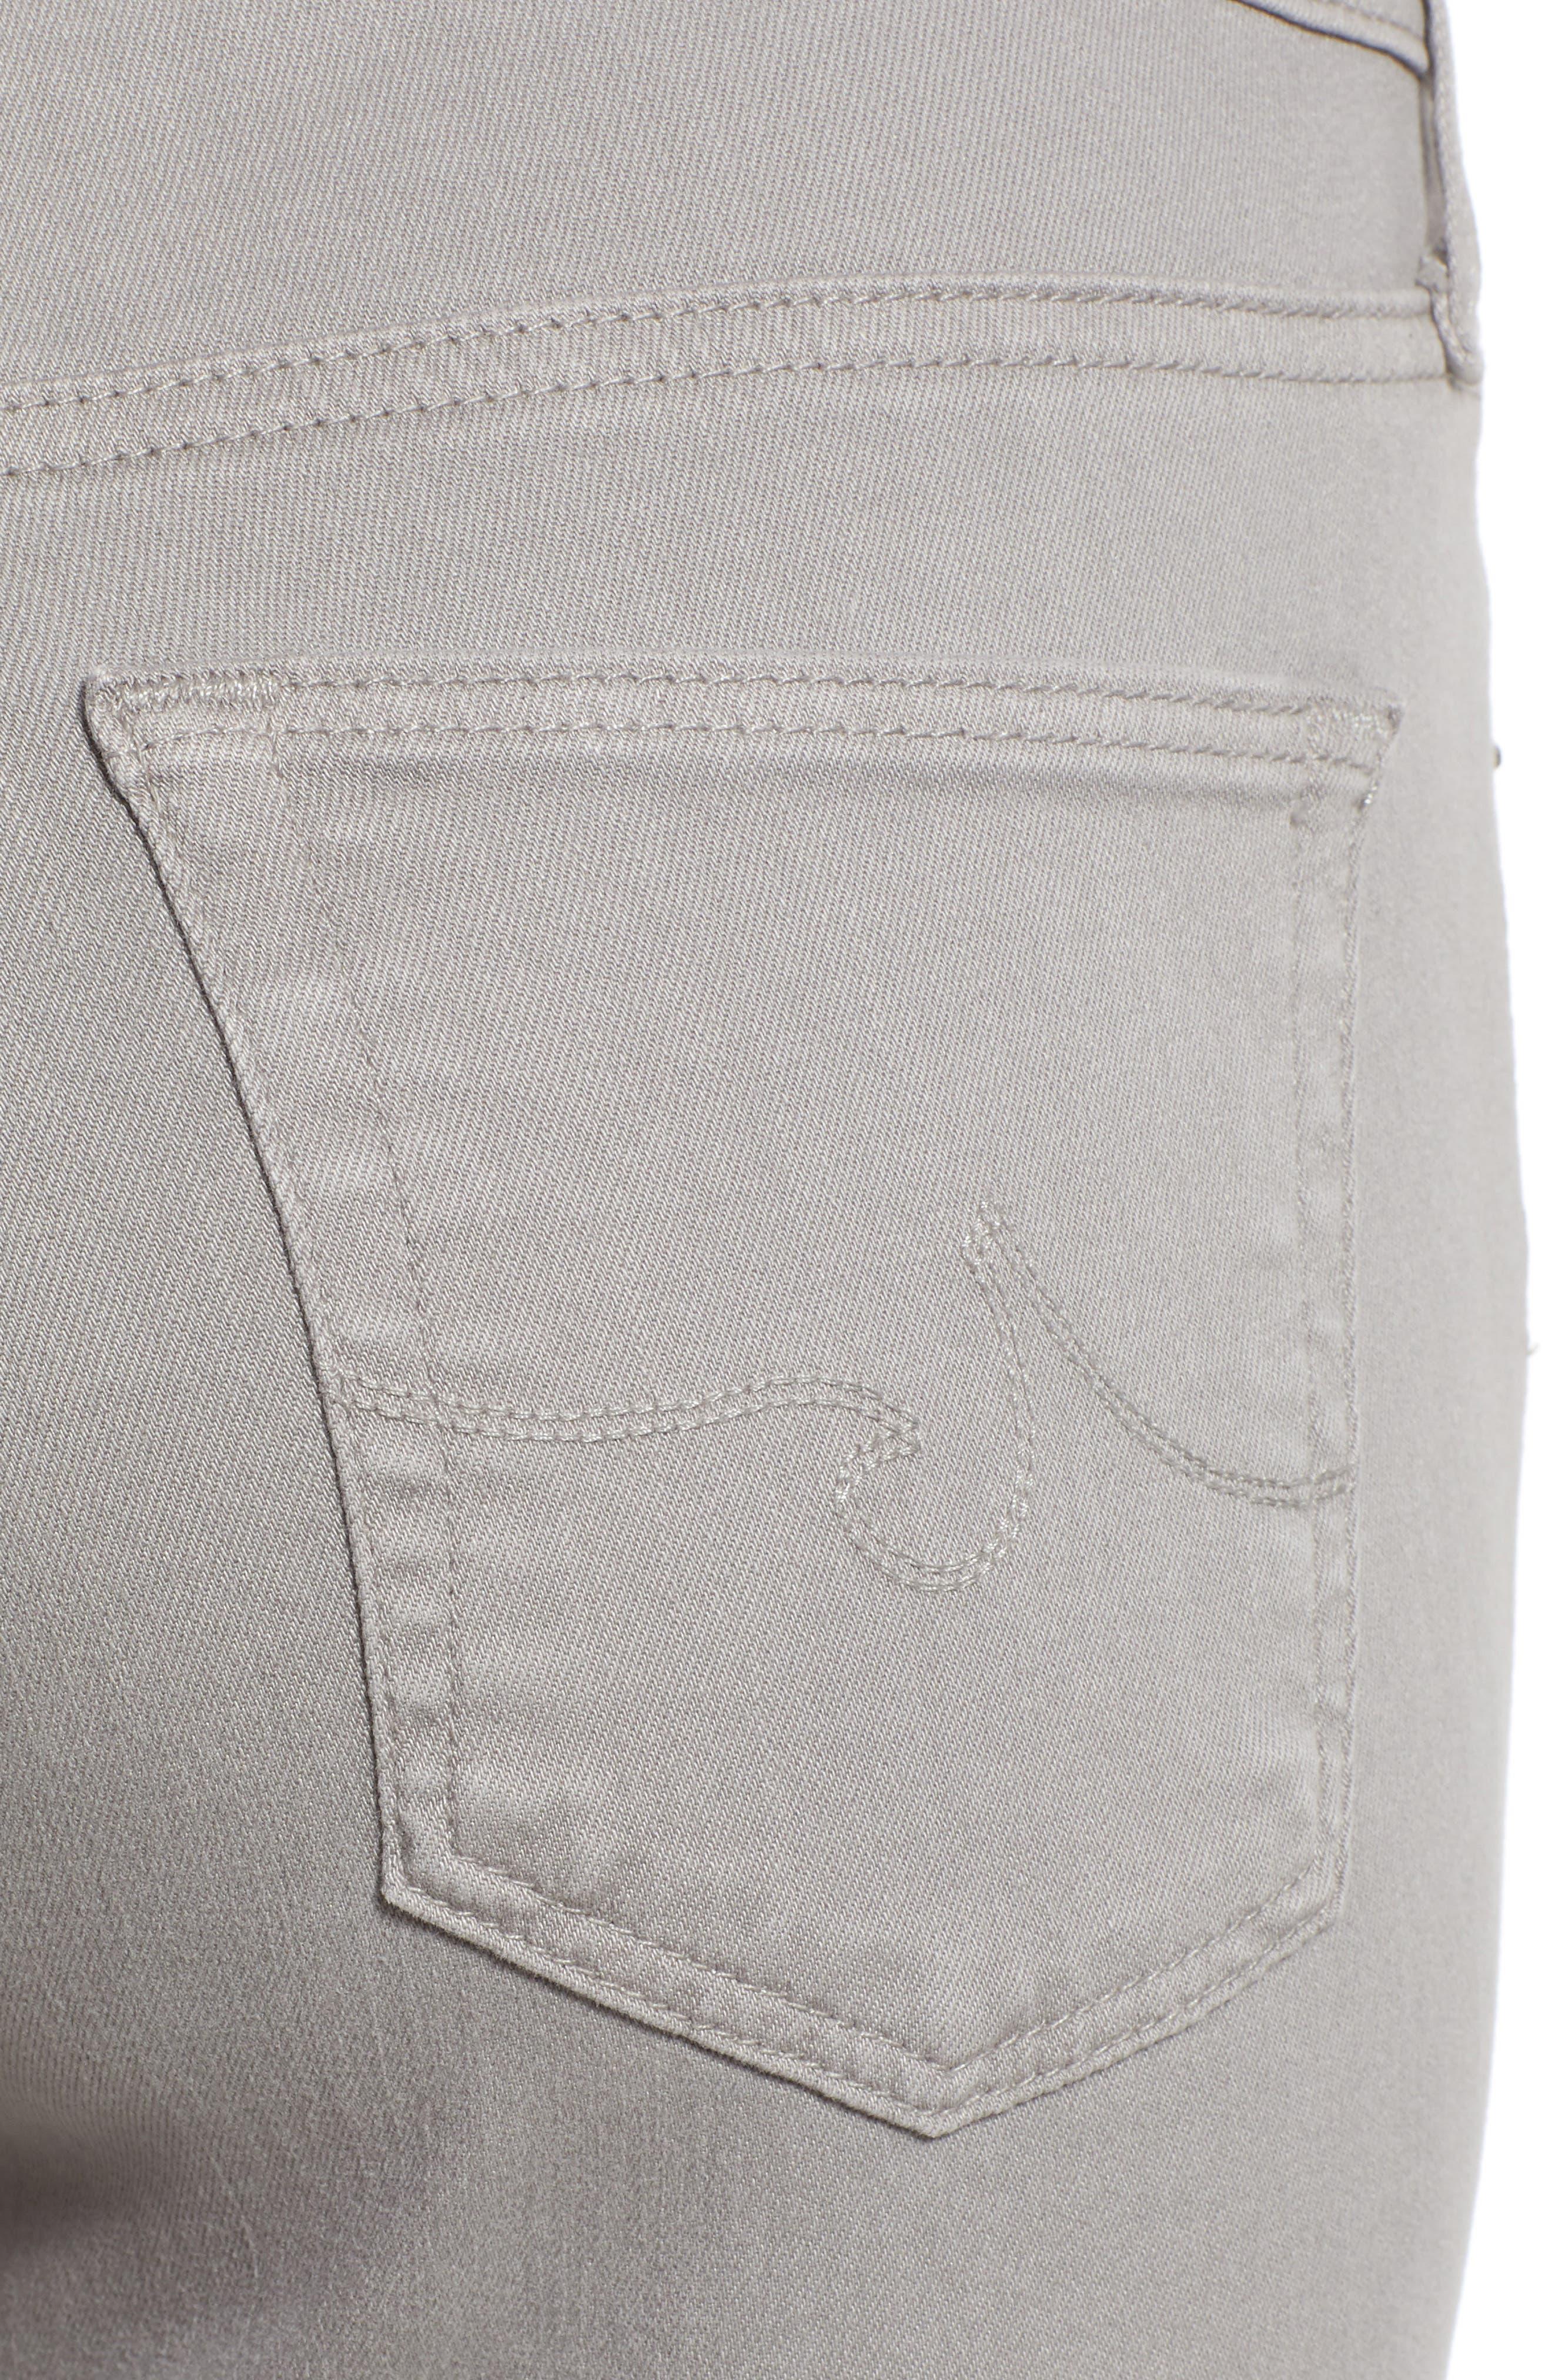 'The Legging' Ankle Jeans,                             Alternate thumbnail 4, color,                             Sulfur Pebble Beach